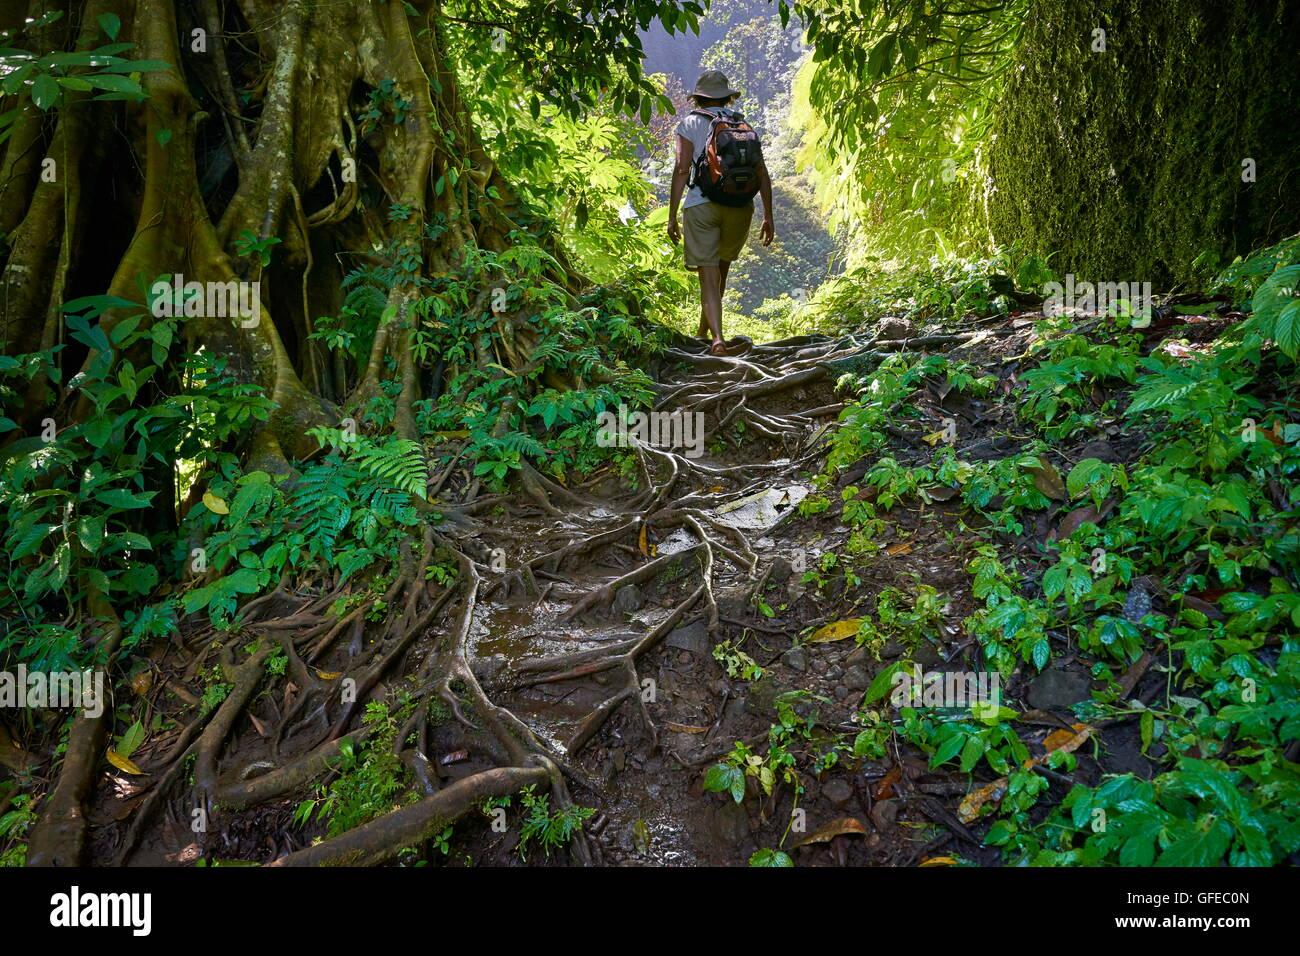 Trekking turístico a través de la selva tropical, Bali, Indonesia Imagen De Stock